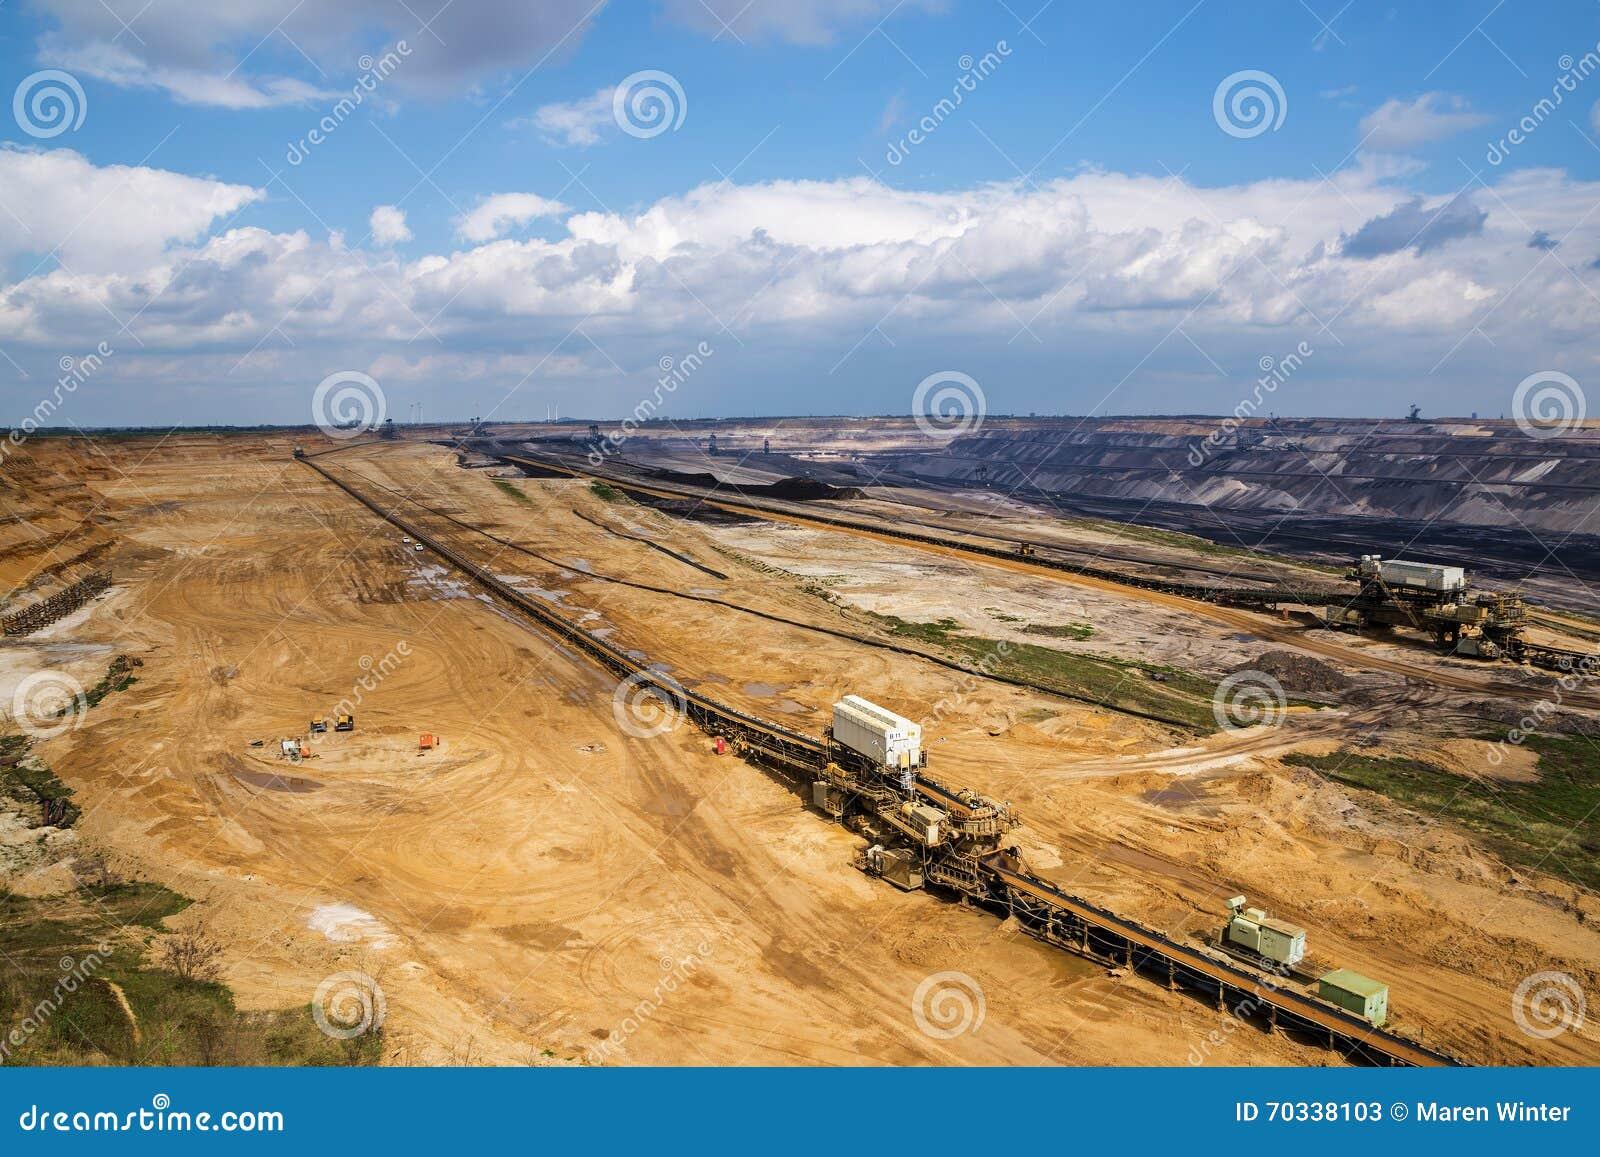 The big hole, lignite (brown coal) strip mining Garzweiler, Germ